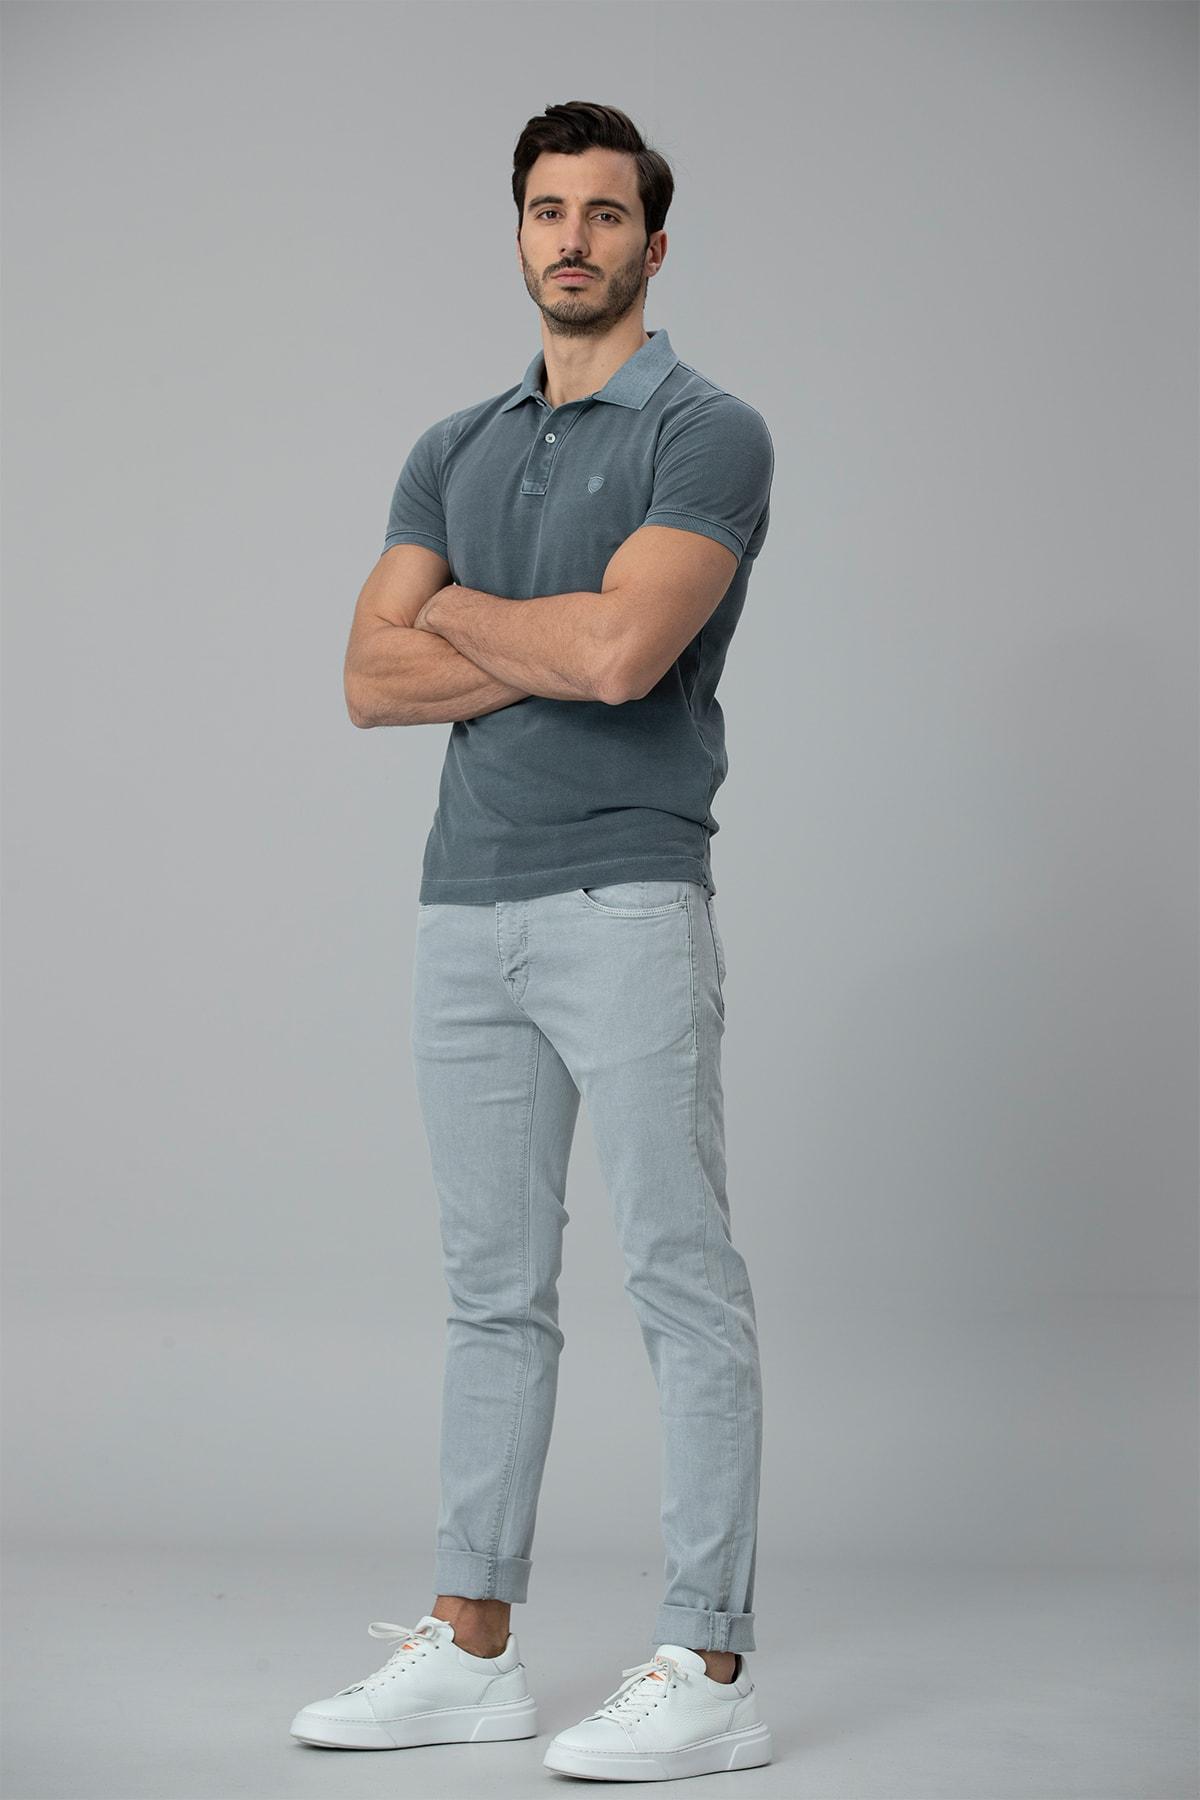 Lufian Kropi Spor 5 Cep Pantolon Slim Fit Gri 0